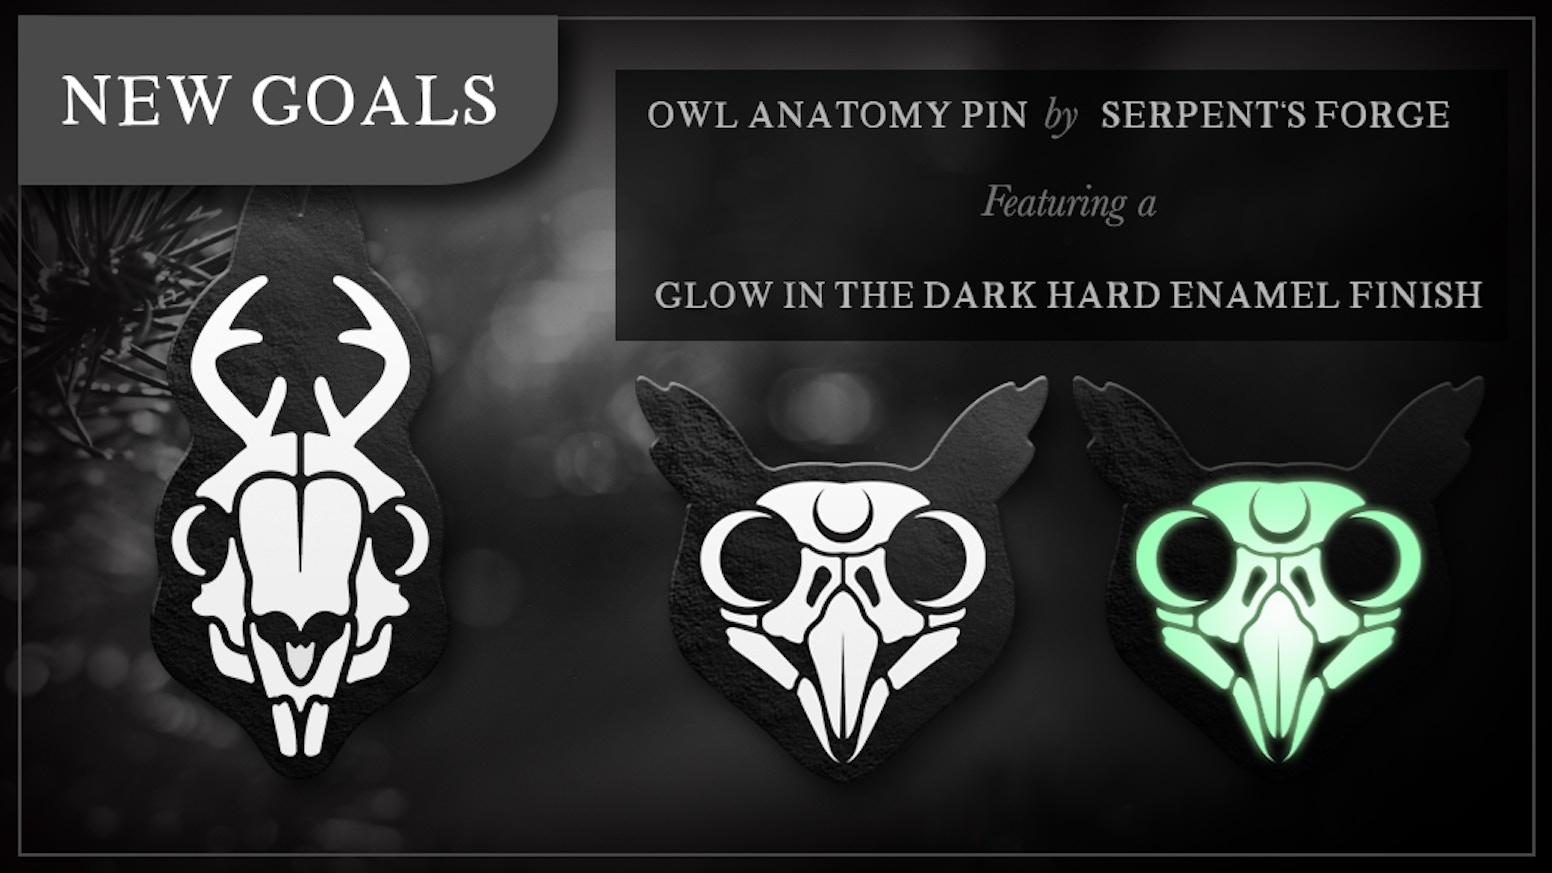 Owl Anatomy Glow in the Dark Hard Enamel Pin by Serpent\'s Forge ...